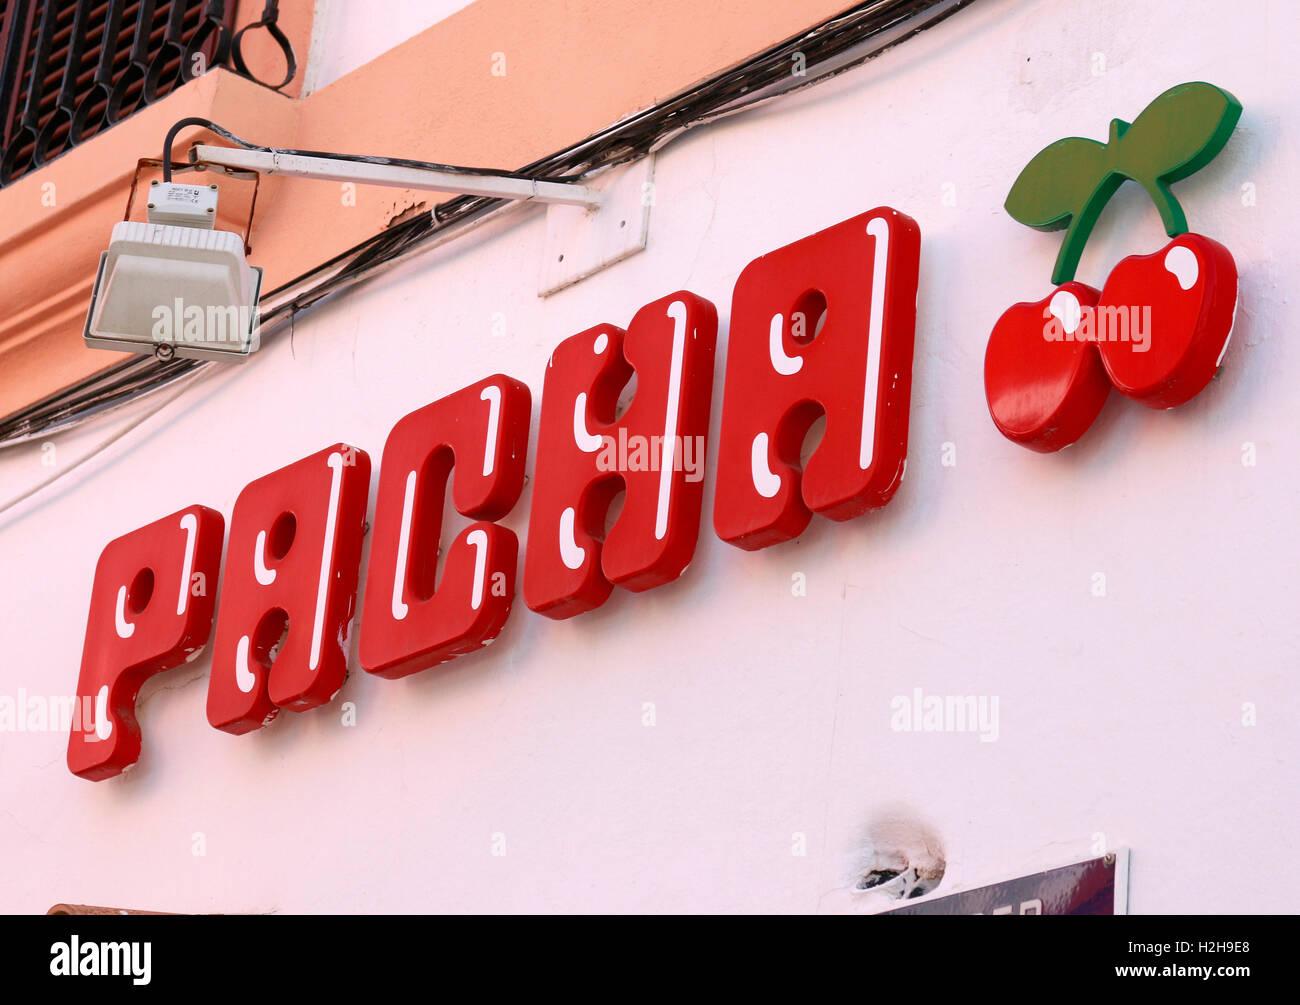 das Logo der Marke 'Pacha', Ibiza, Spanien. - Stock Image